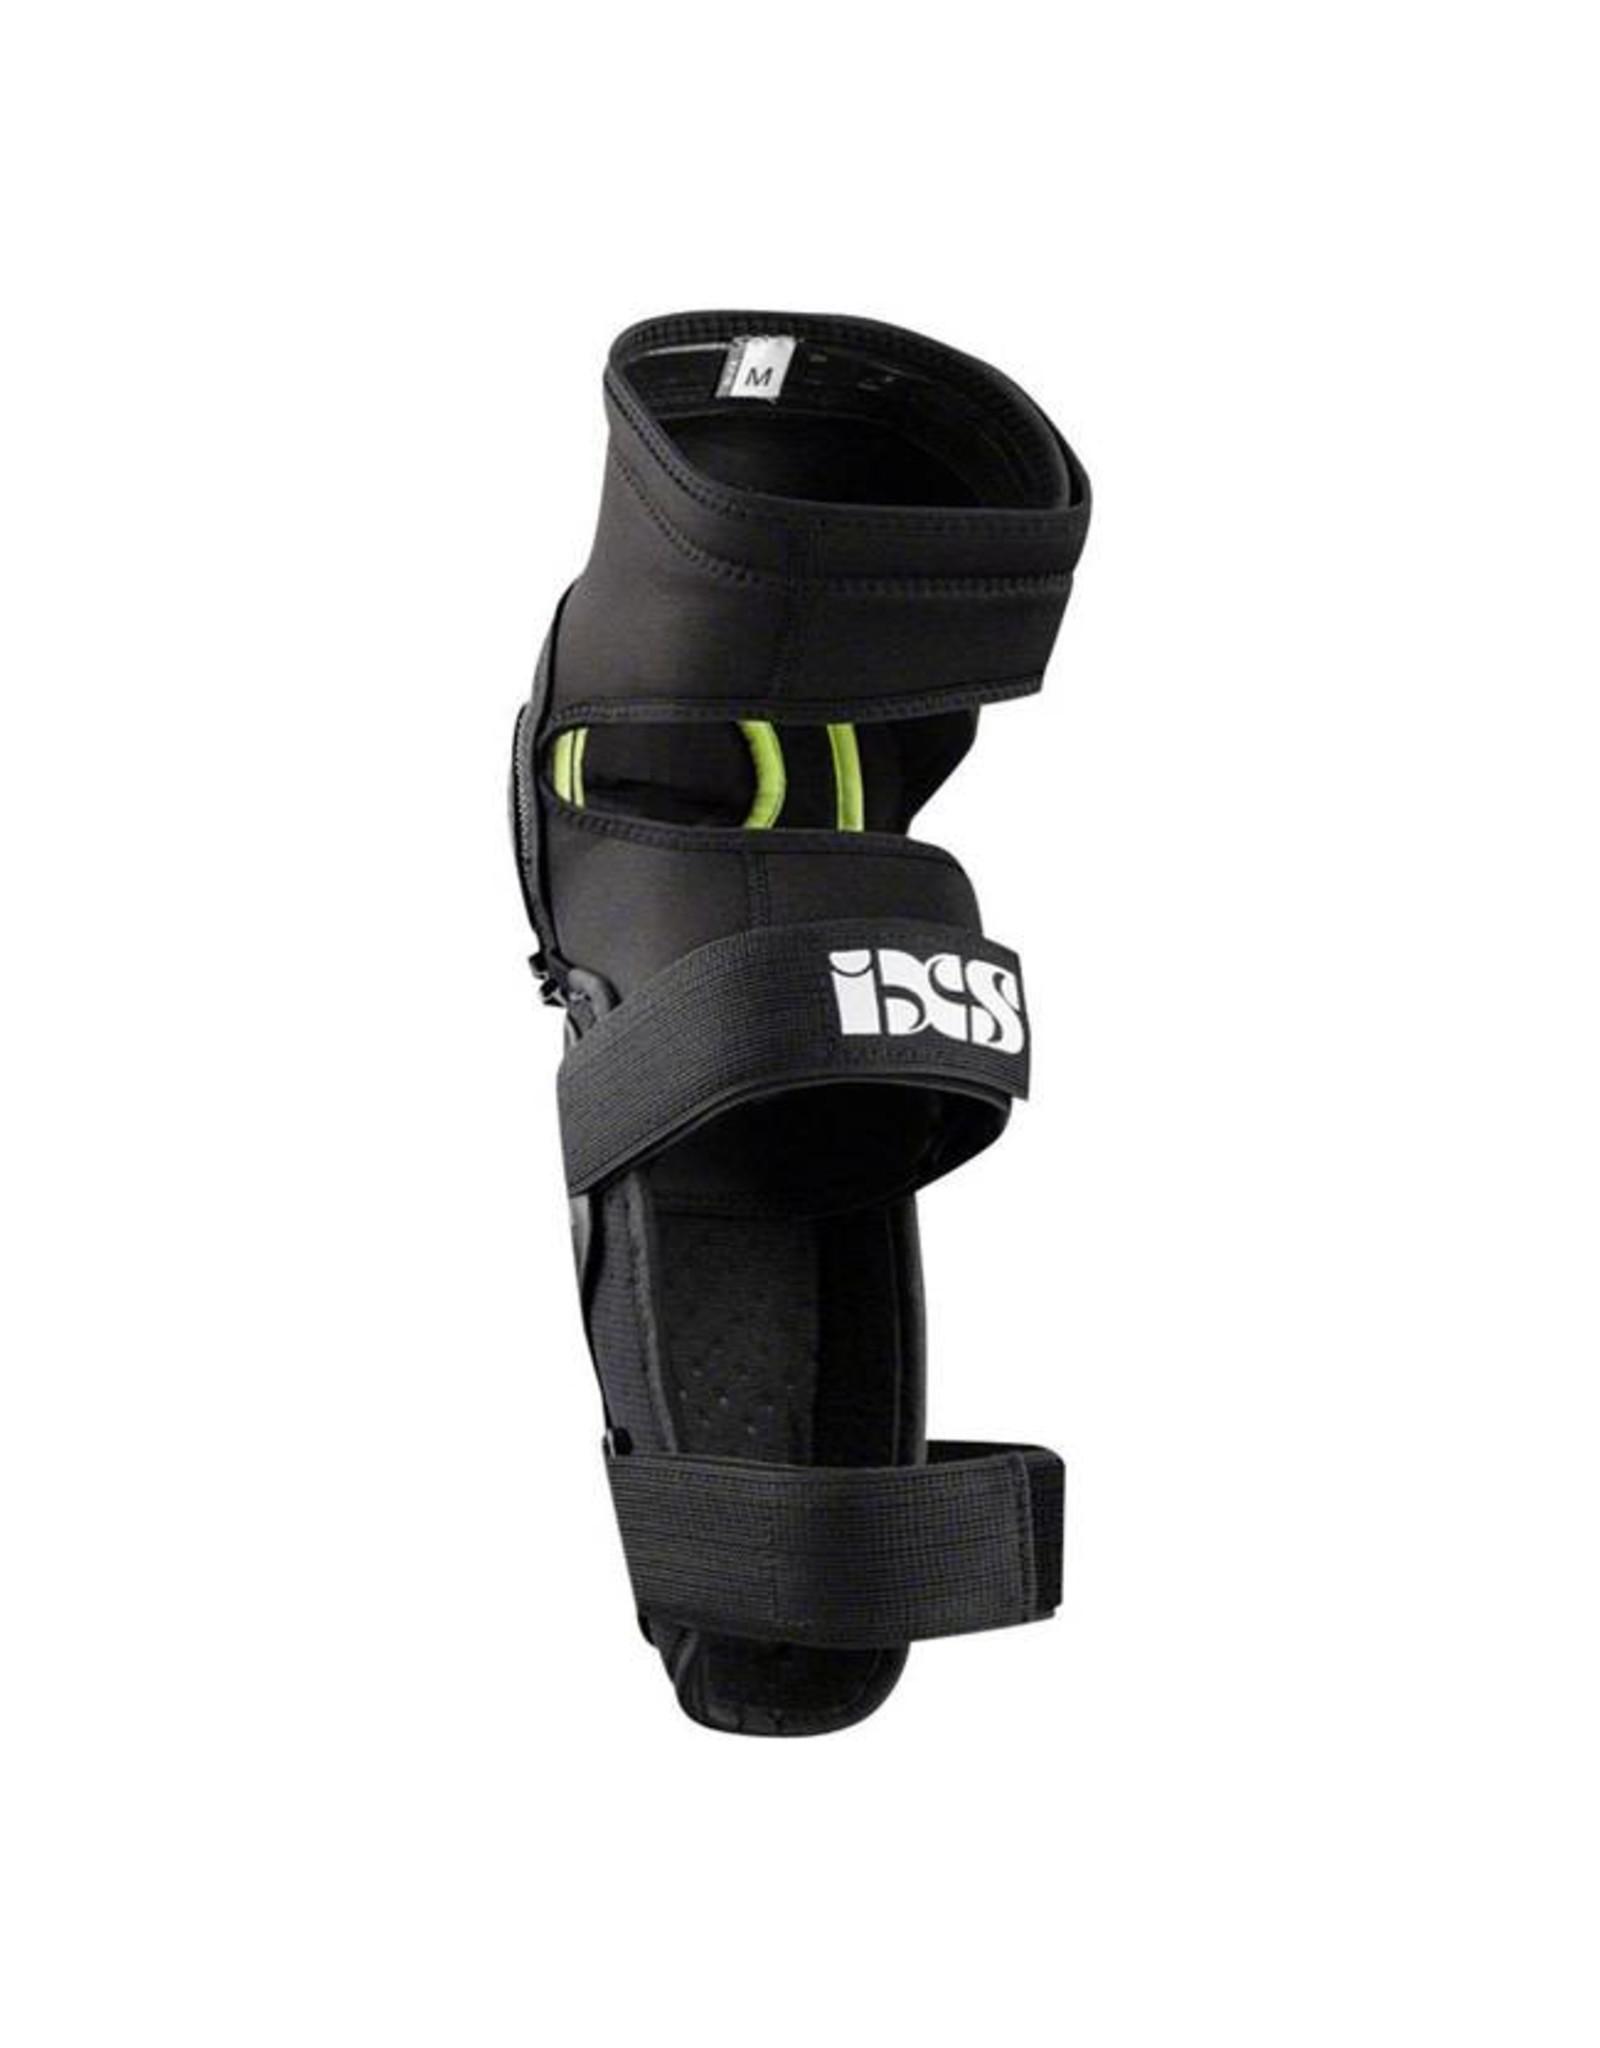 IXS iXS Mallet Knee/Shin Guard: Black, MD